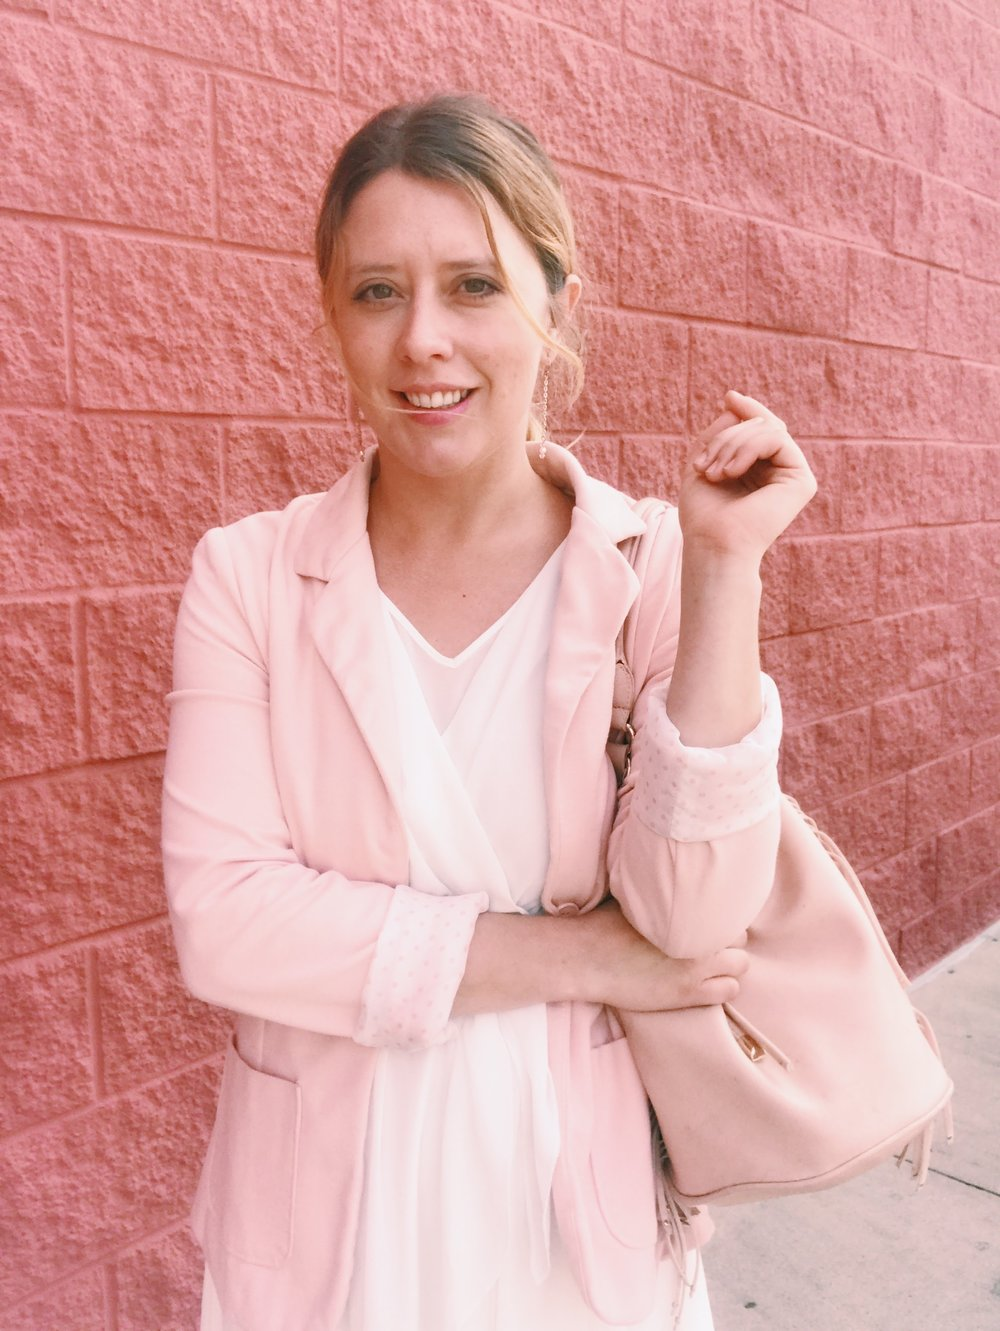 Three Heel Clicks - Sweet Office Wear (9).jpg